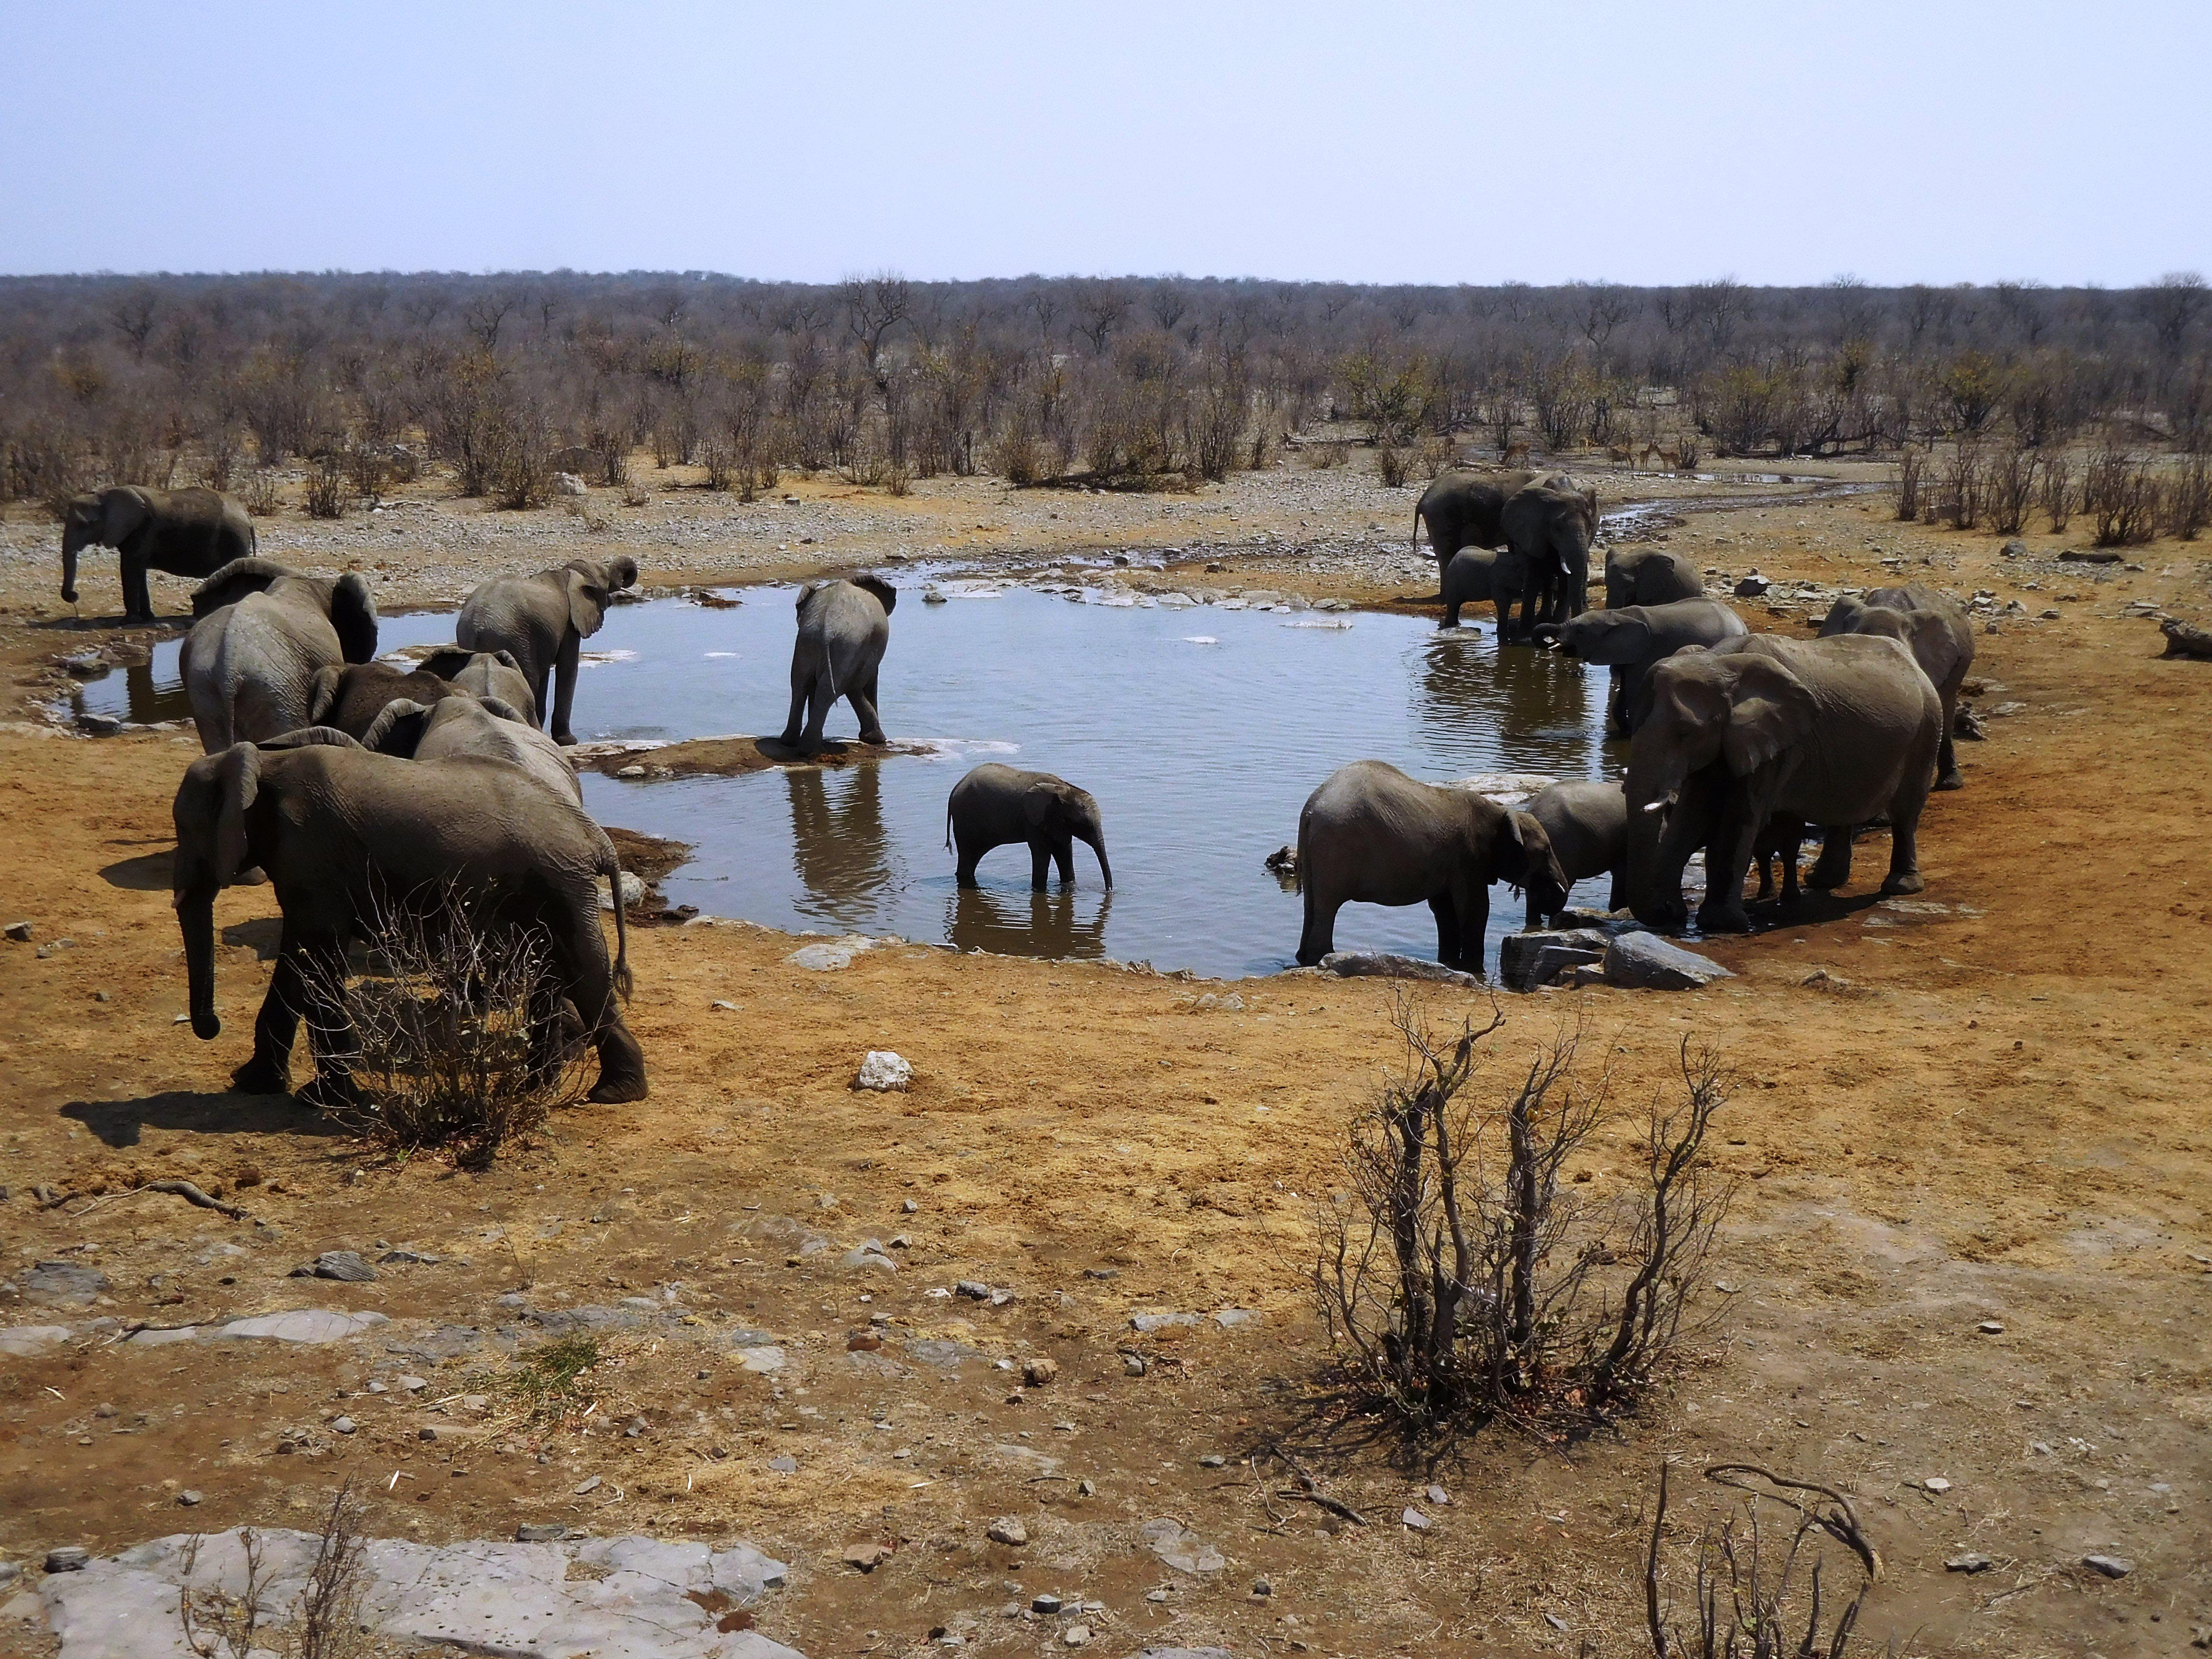 Elefanten am Wasserloch im Etosha-Nationalpark, Namibia